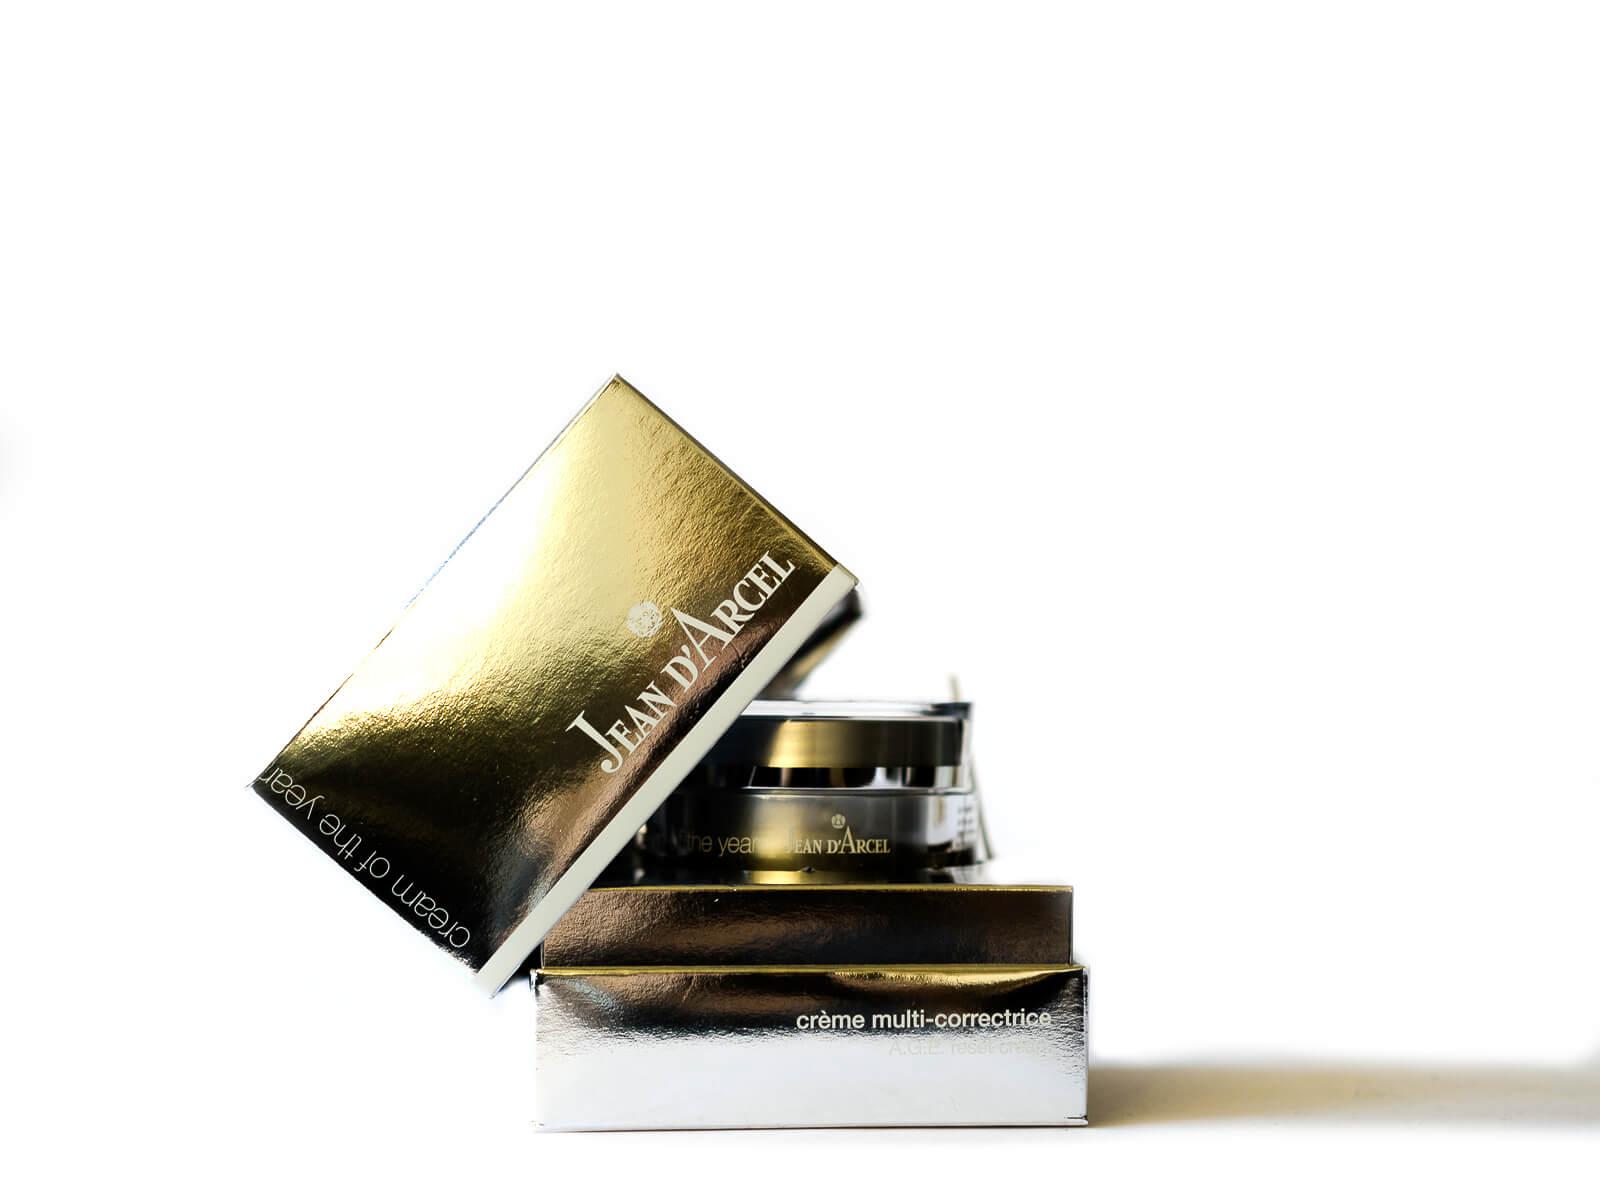 Cream of the year - Crème Multi-Correctrice von JEAN D'ARCEL